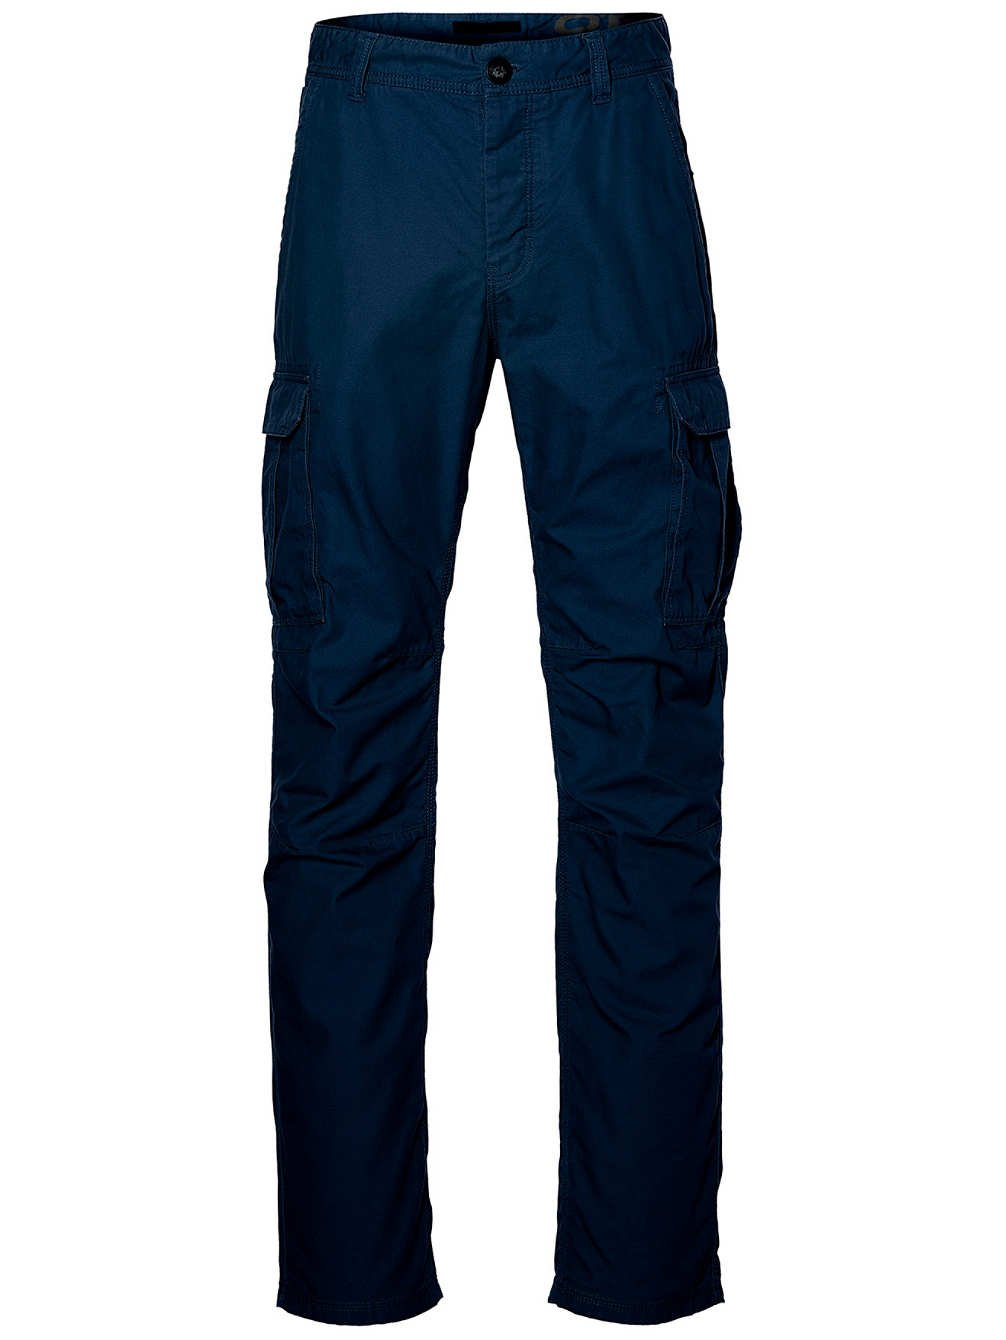 O'Neill Herren Janga Cargo Pants Hose